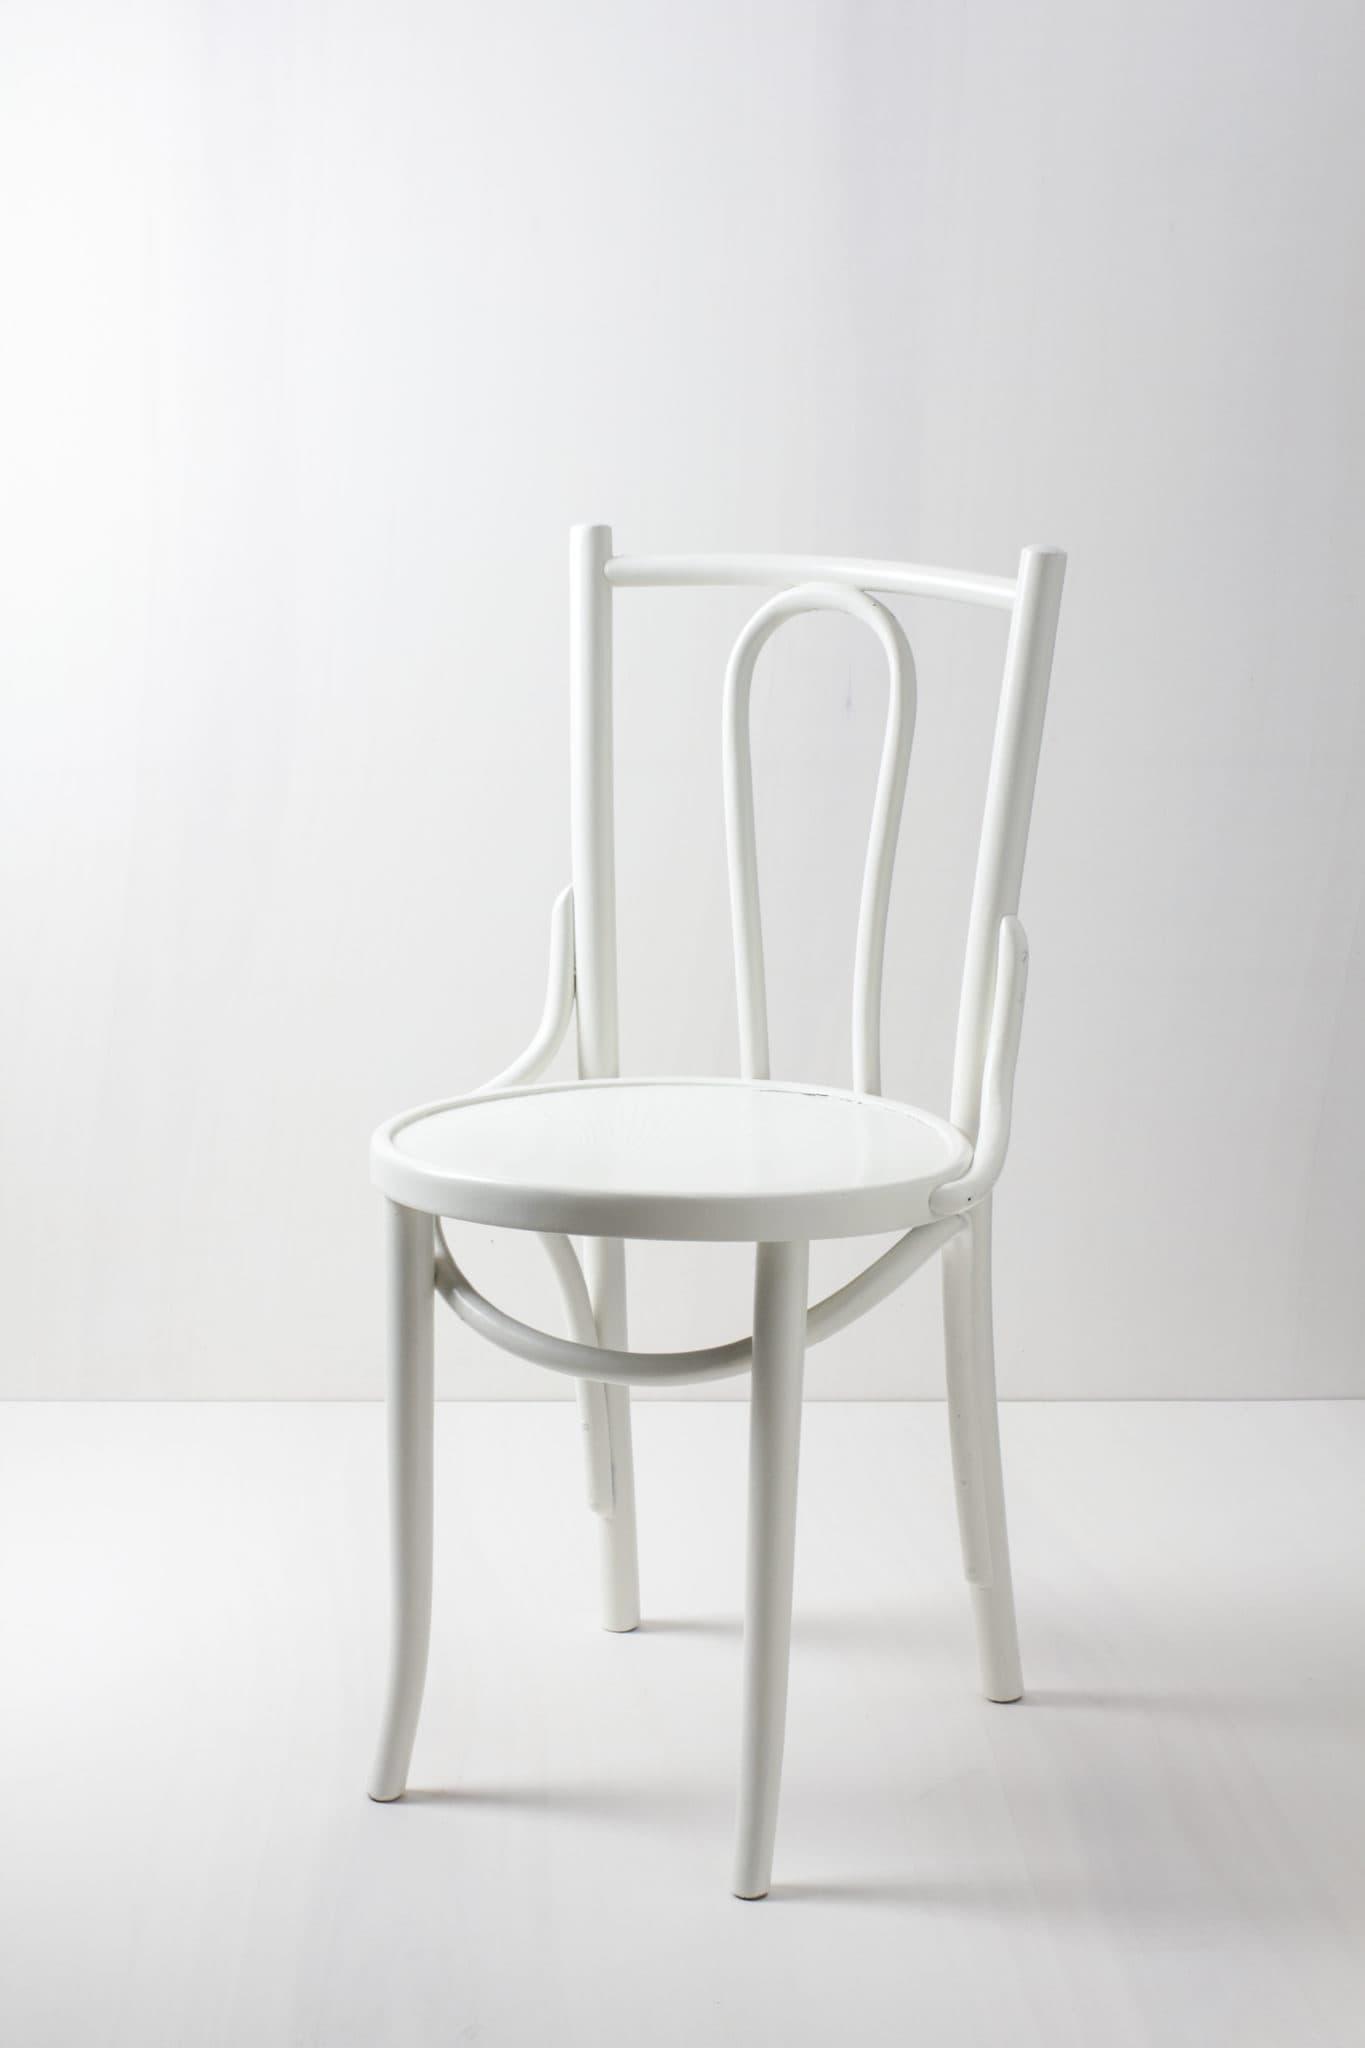 Thonet Stuhl, weiße Stuhl Klassiker zu mieten